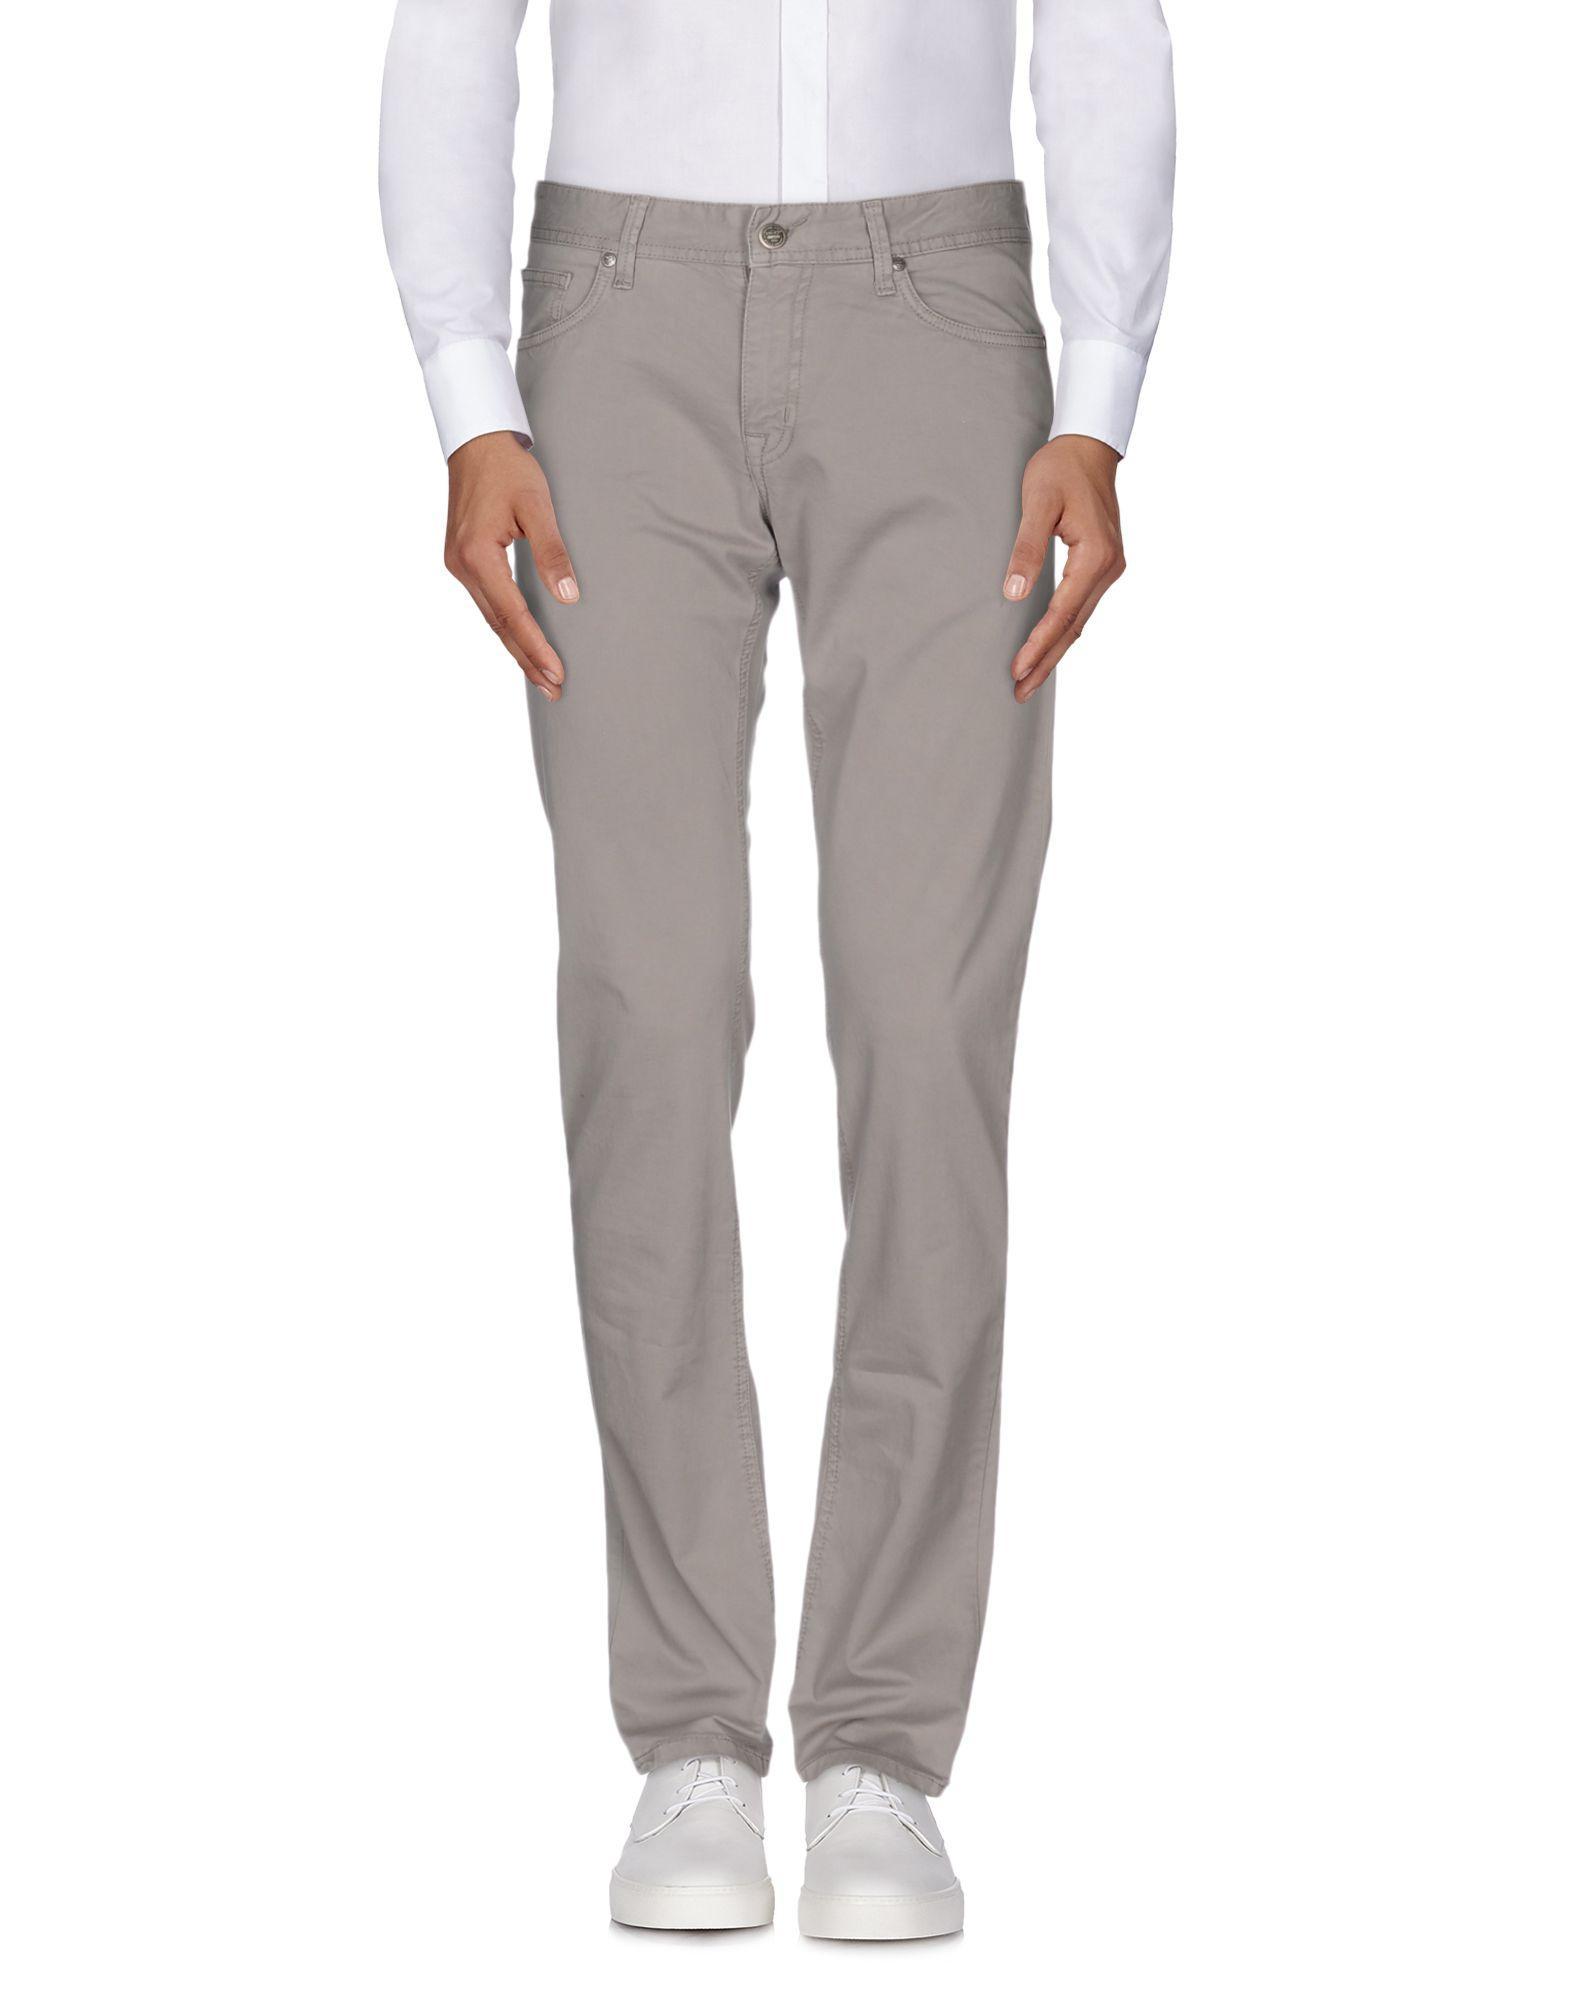 Liu •jo 5-pocket In Grey